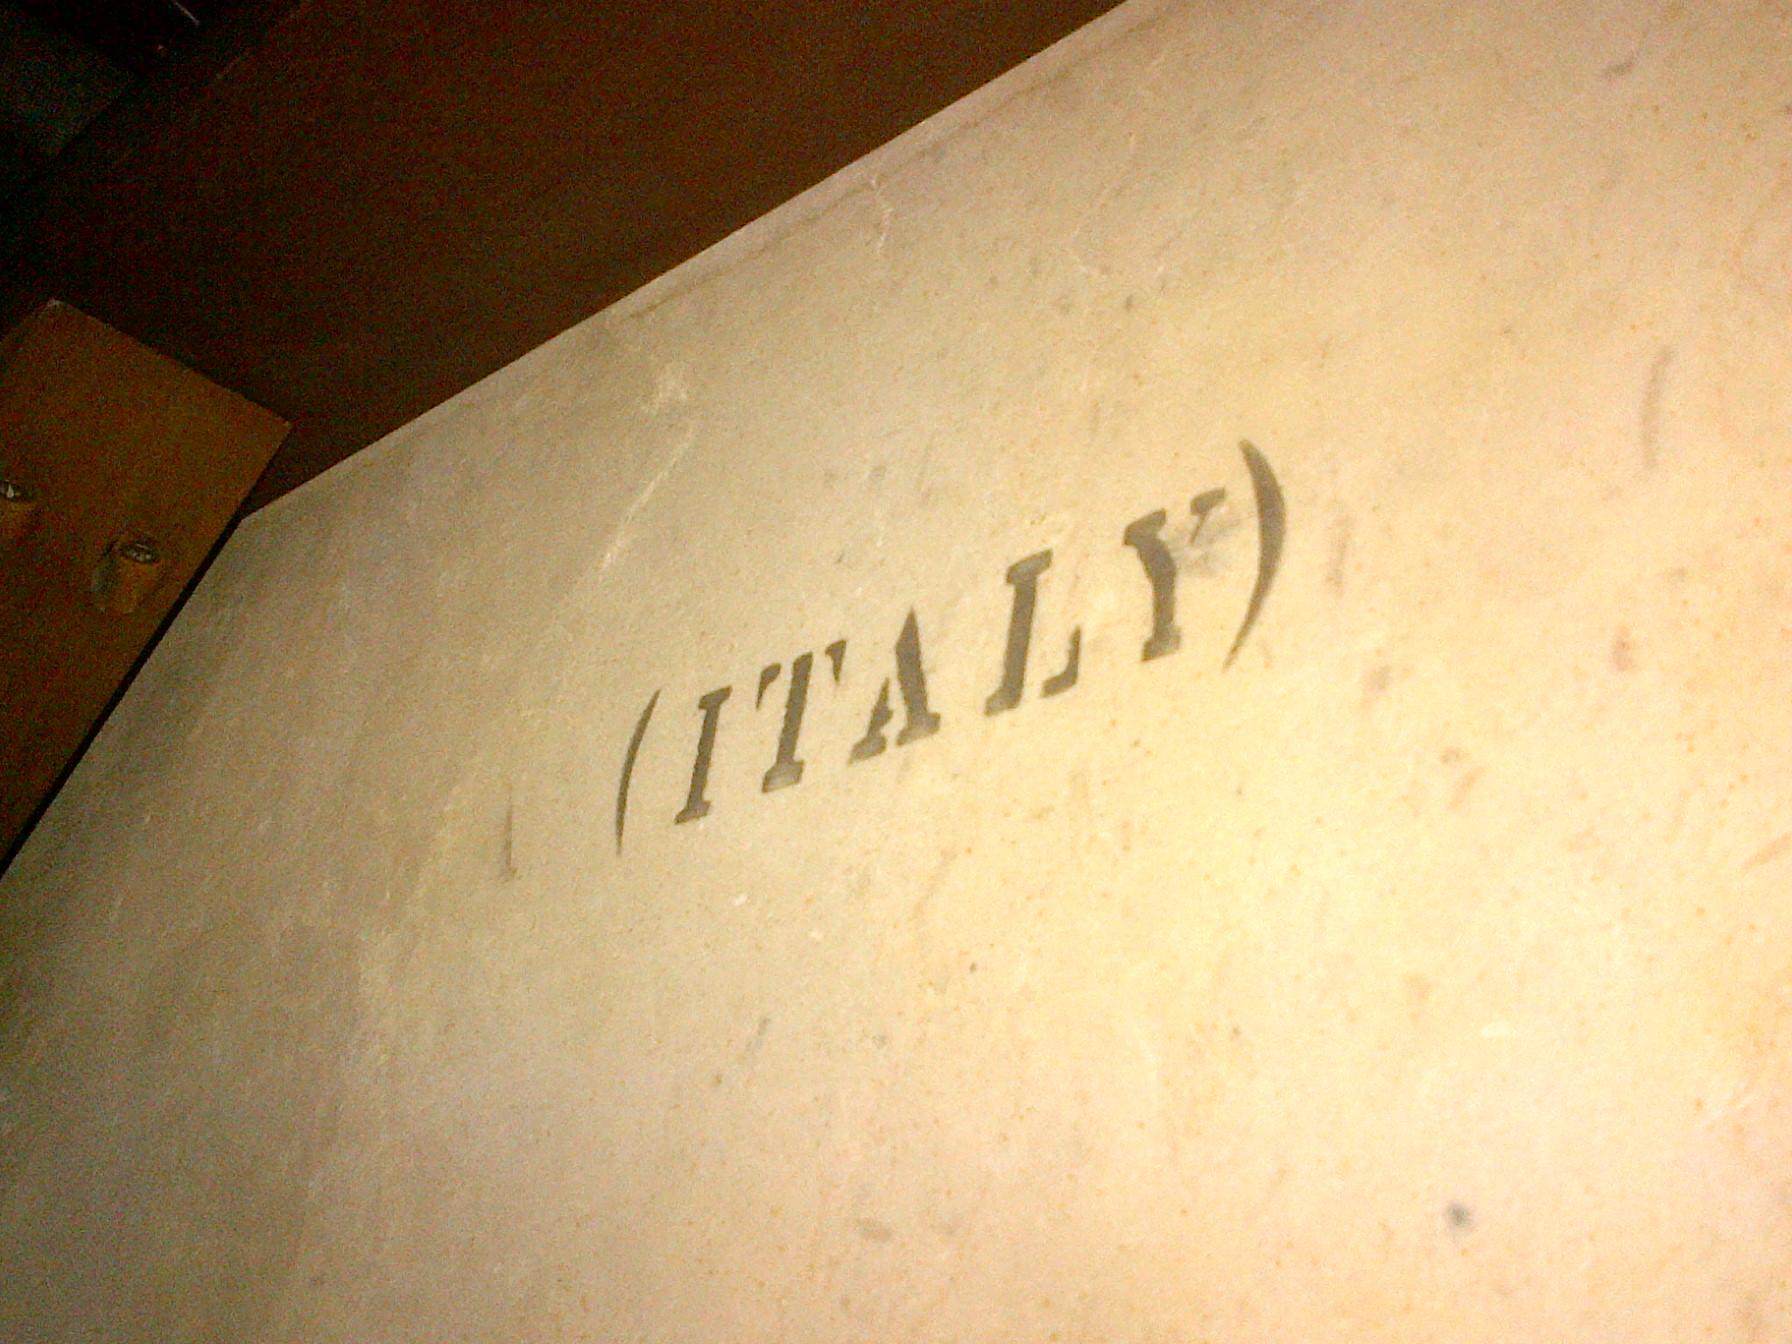 under table stamp.jpg